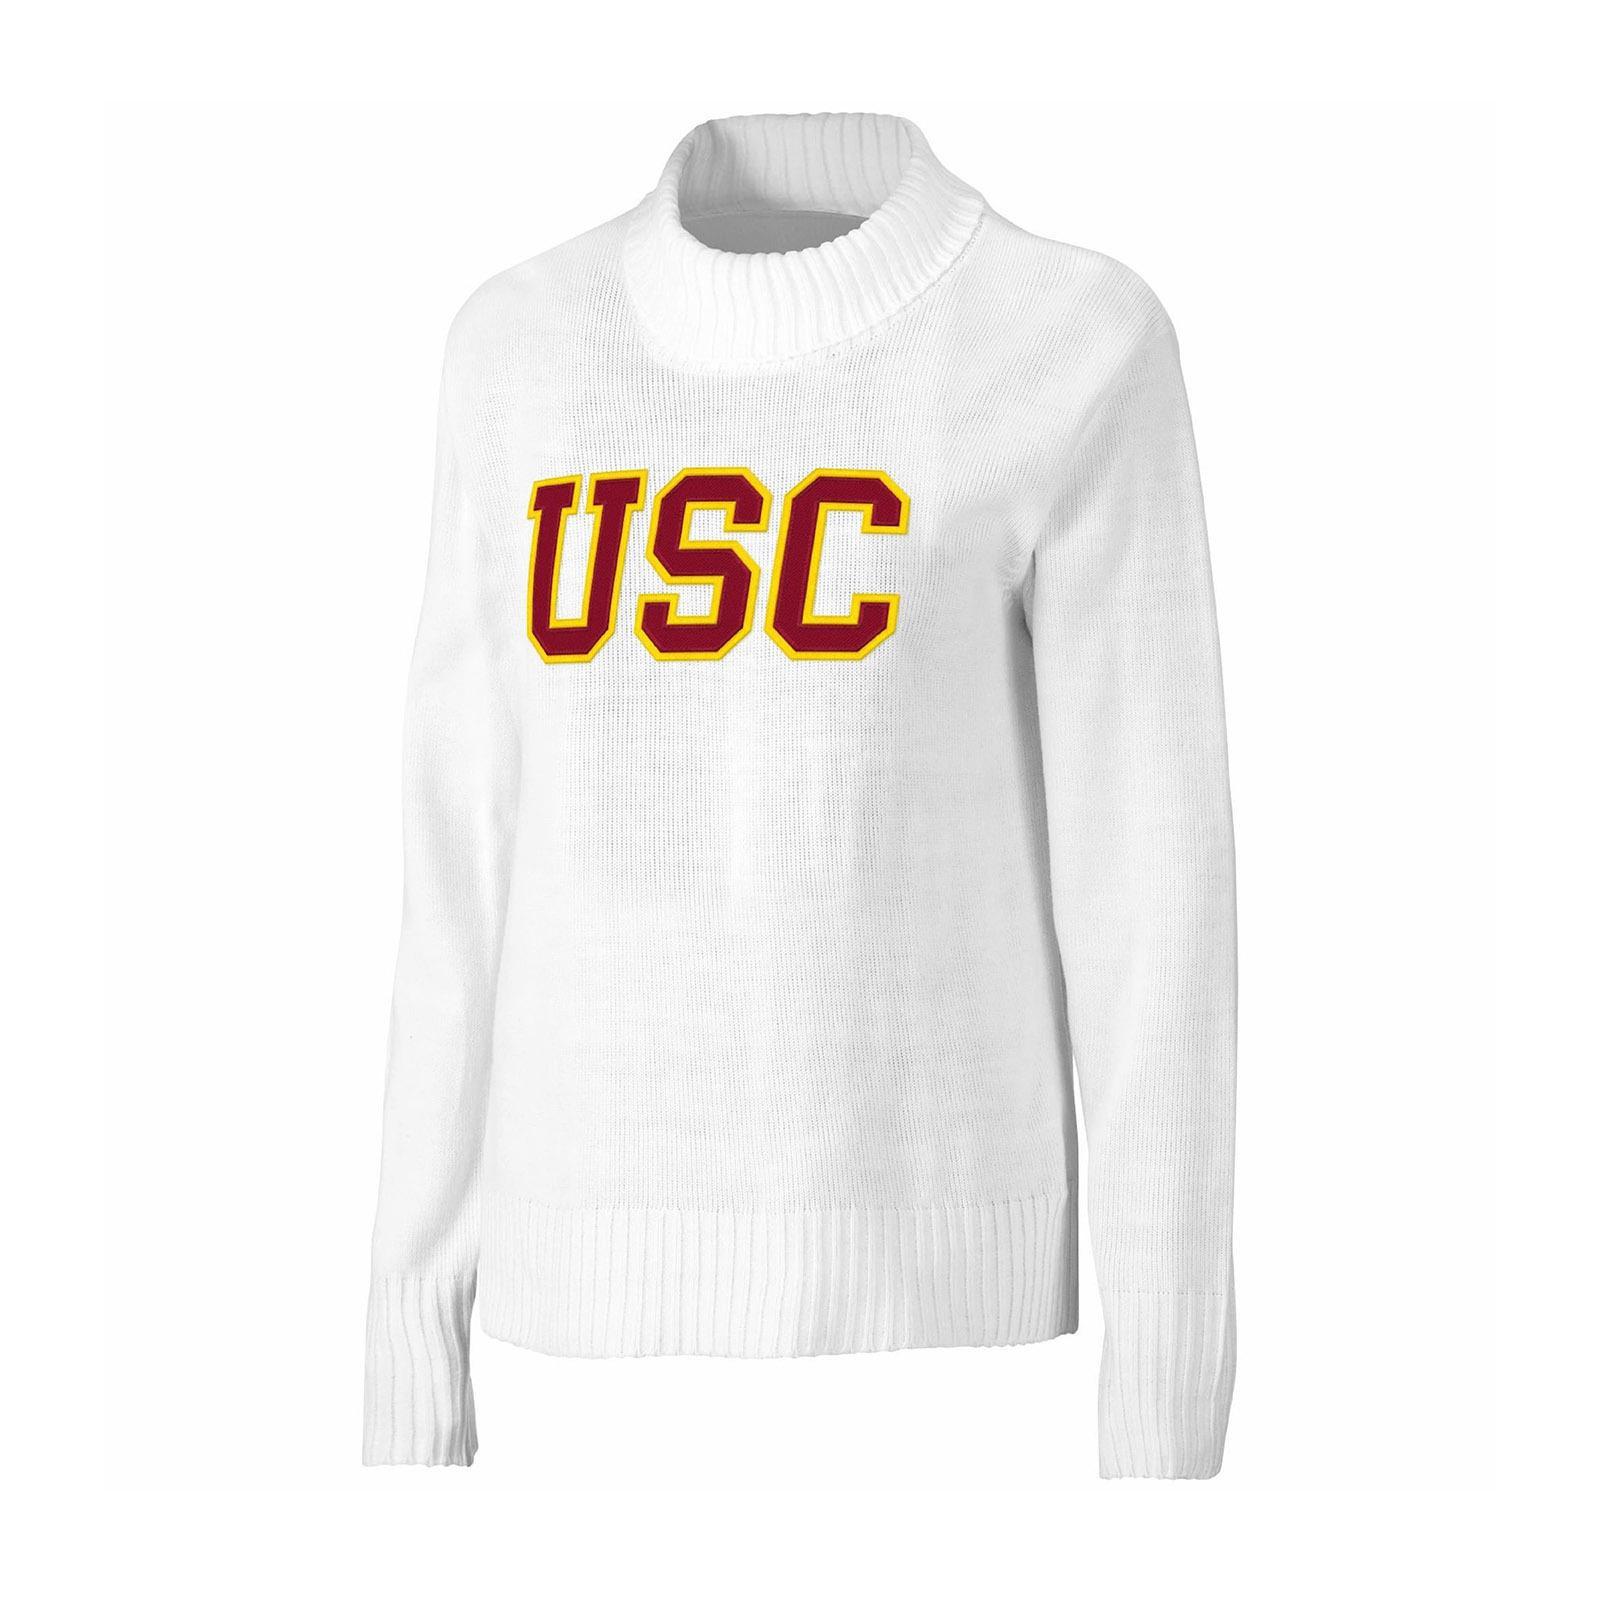 Youth USC Trojans Kids Short Sleeve Tee Toddler Infant